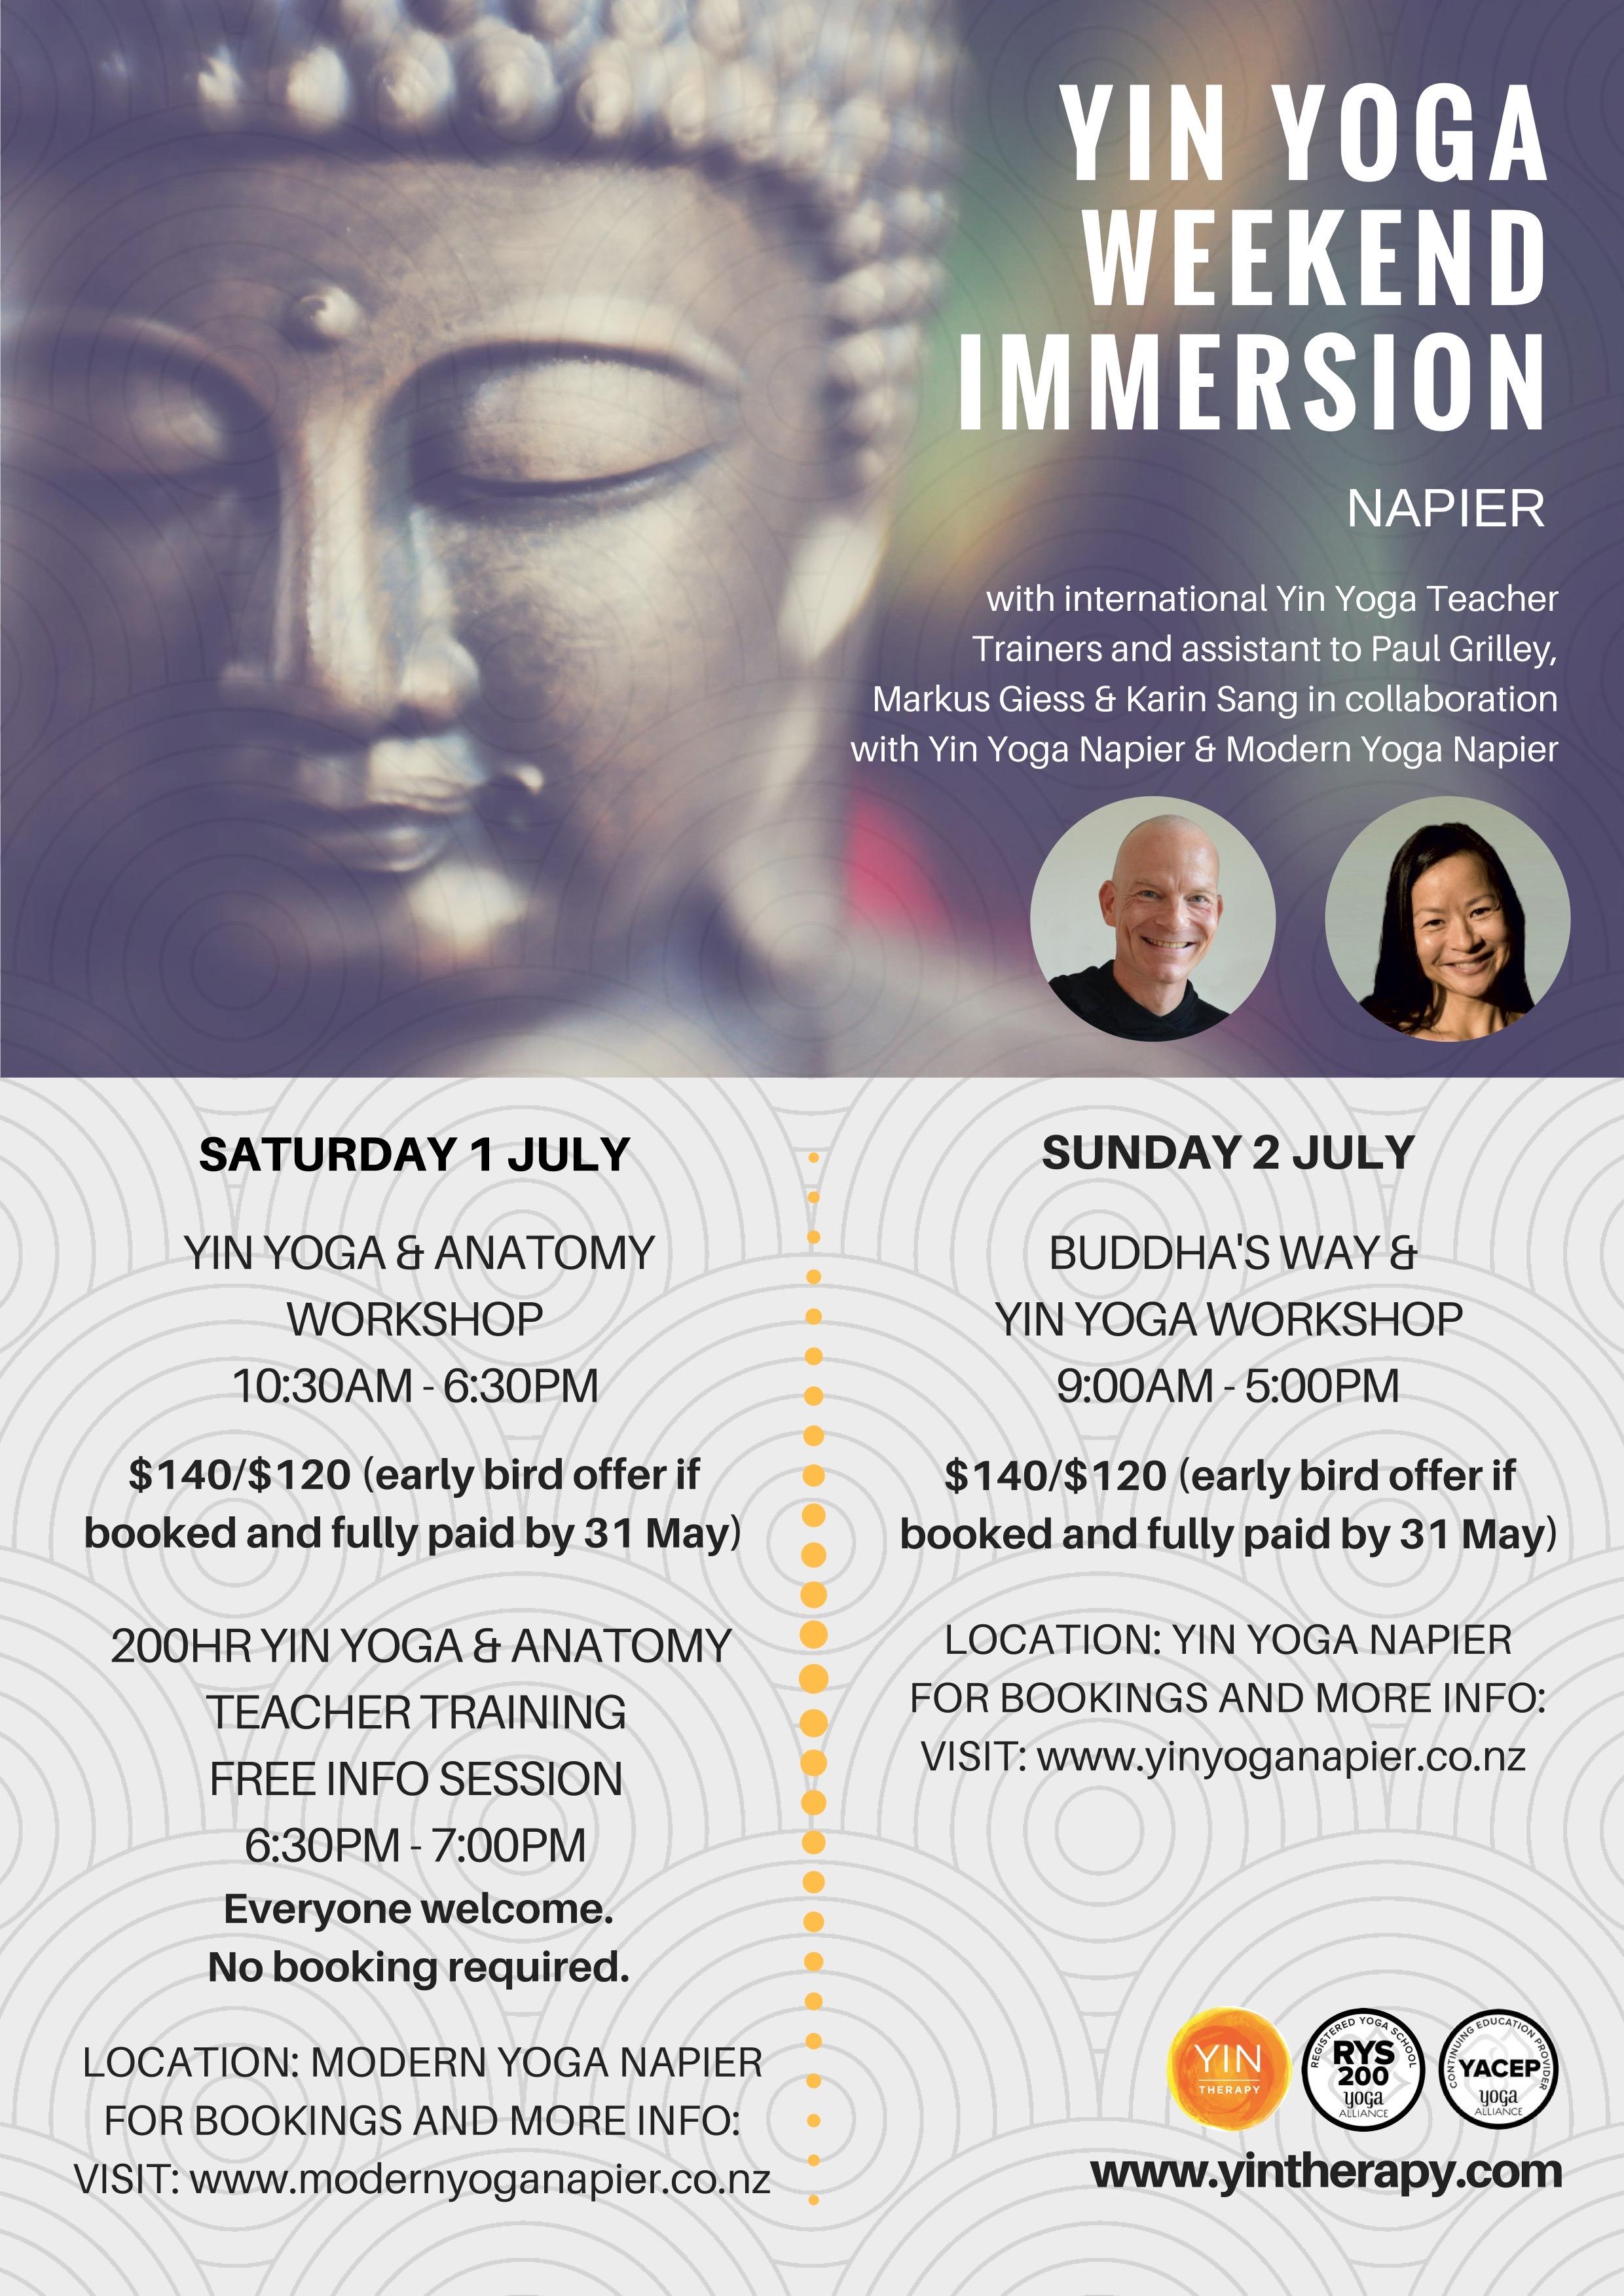 Yin Yoga Weekend Immersion